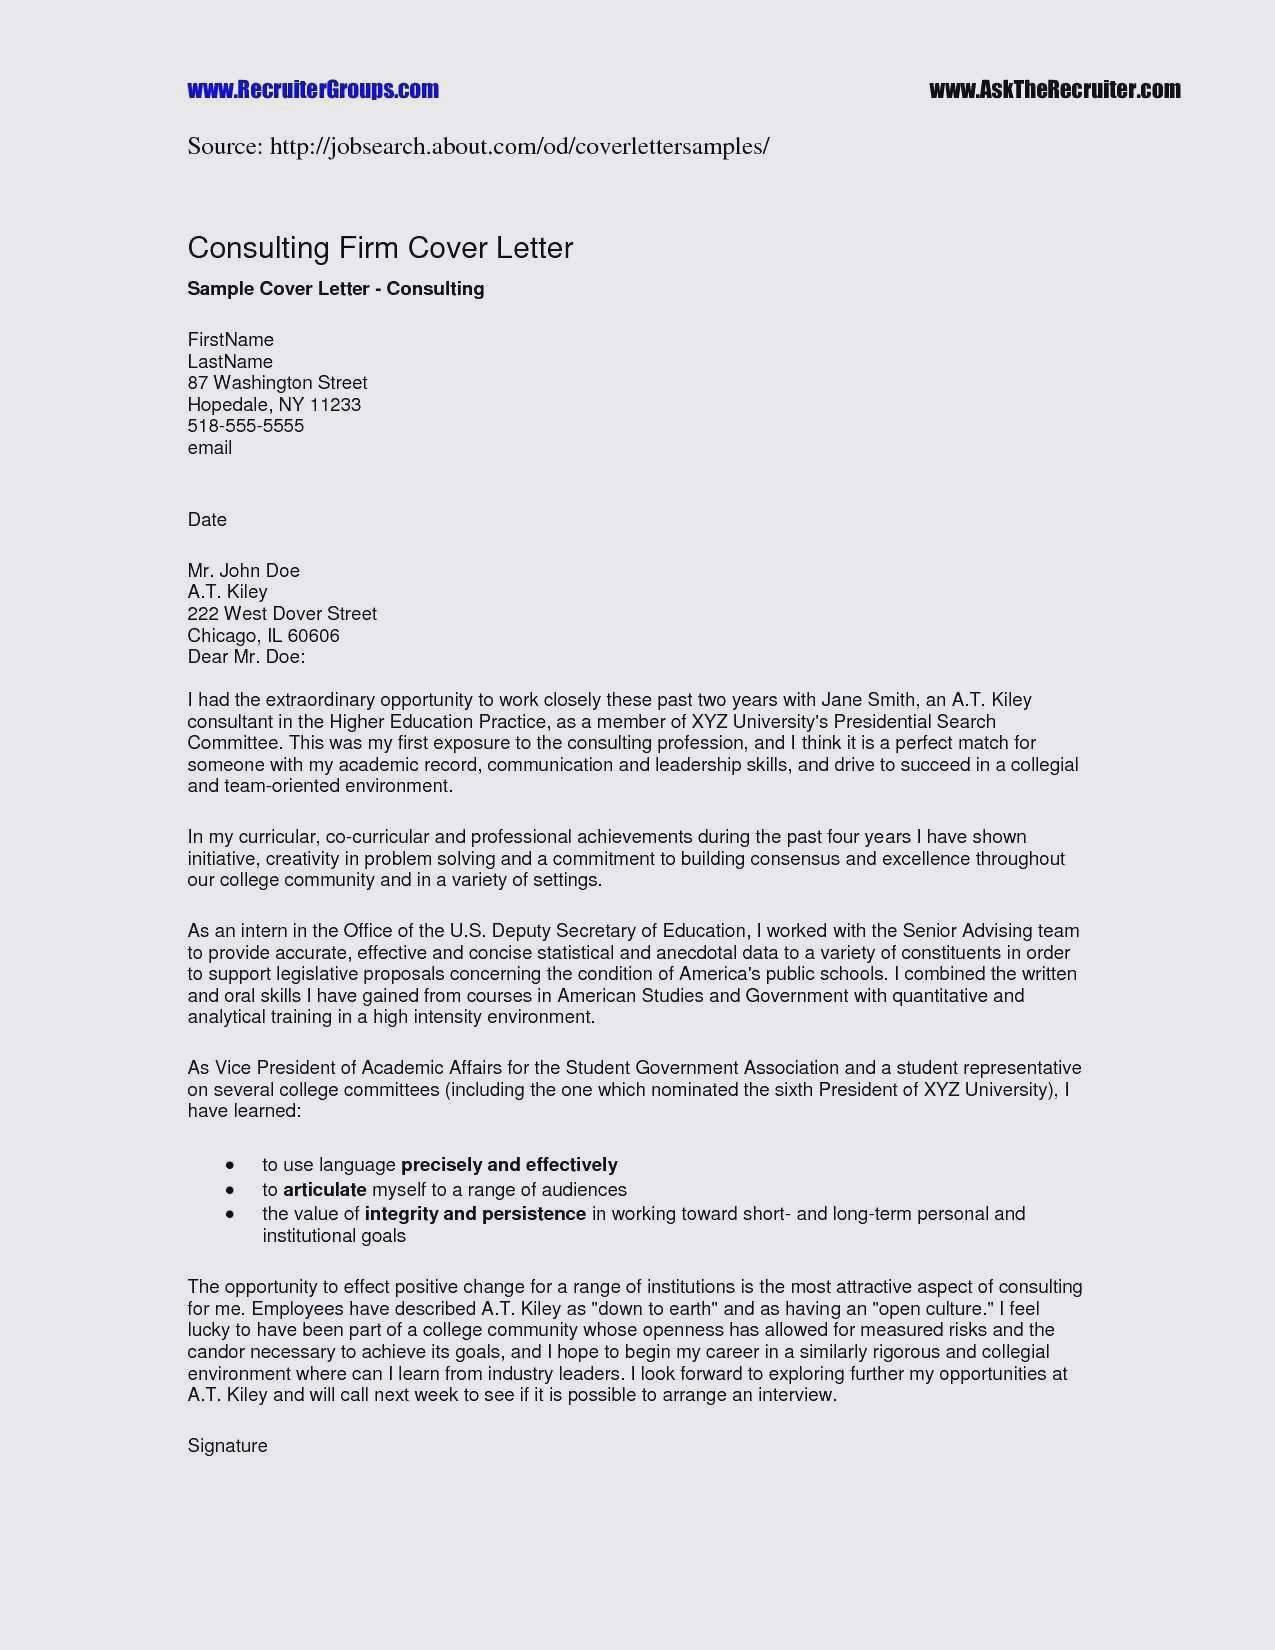 modele lettre de motivation leclerc cv open fice modifiable open fice resume template free valid concept of modele lettre de motivation leclerc